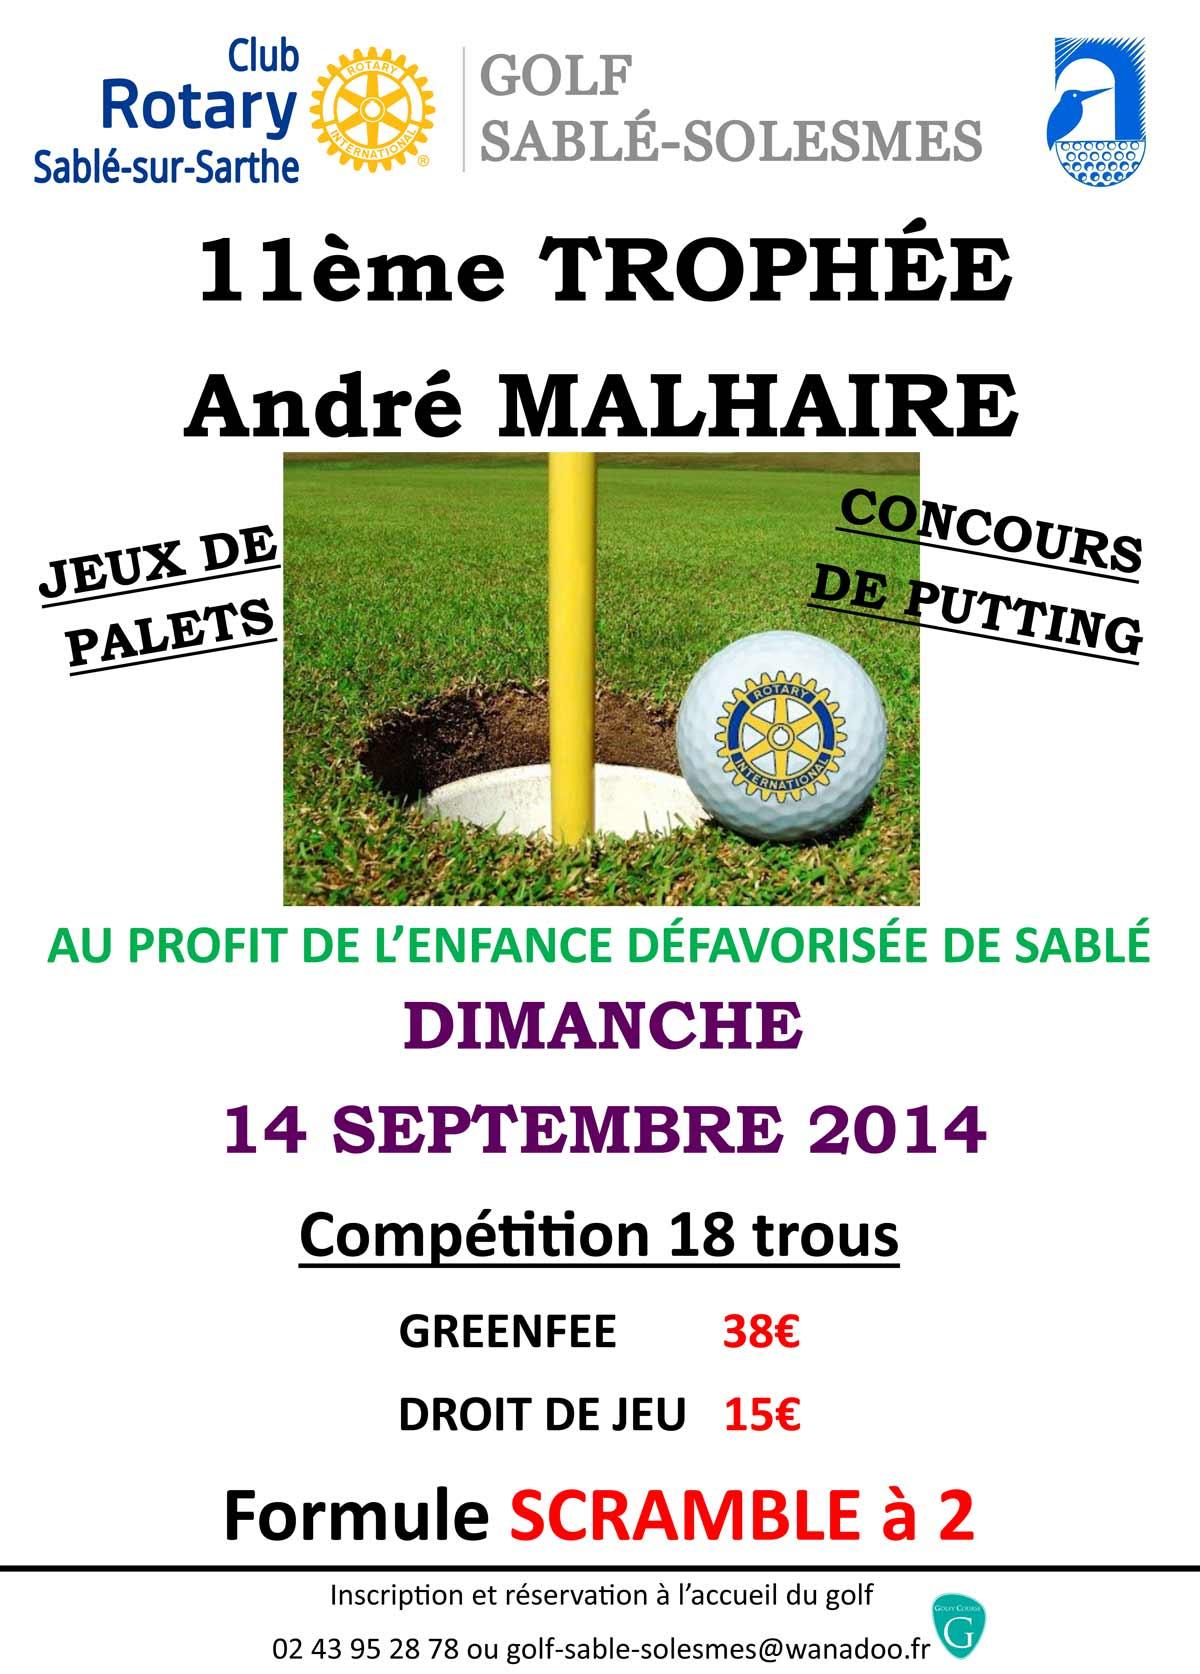 Trophee-Malhaire-2014